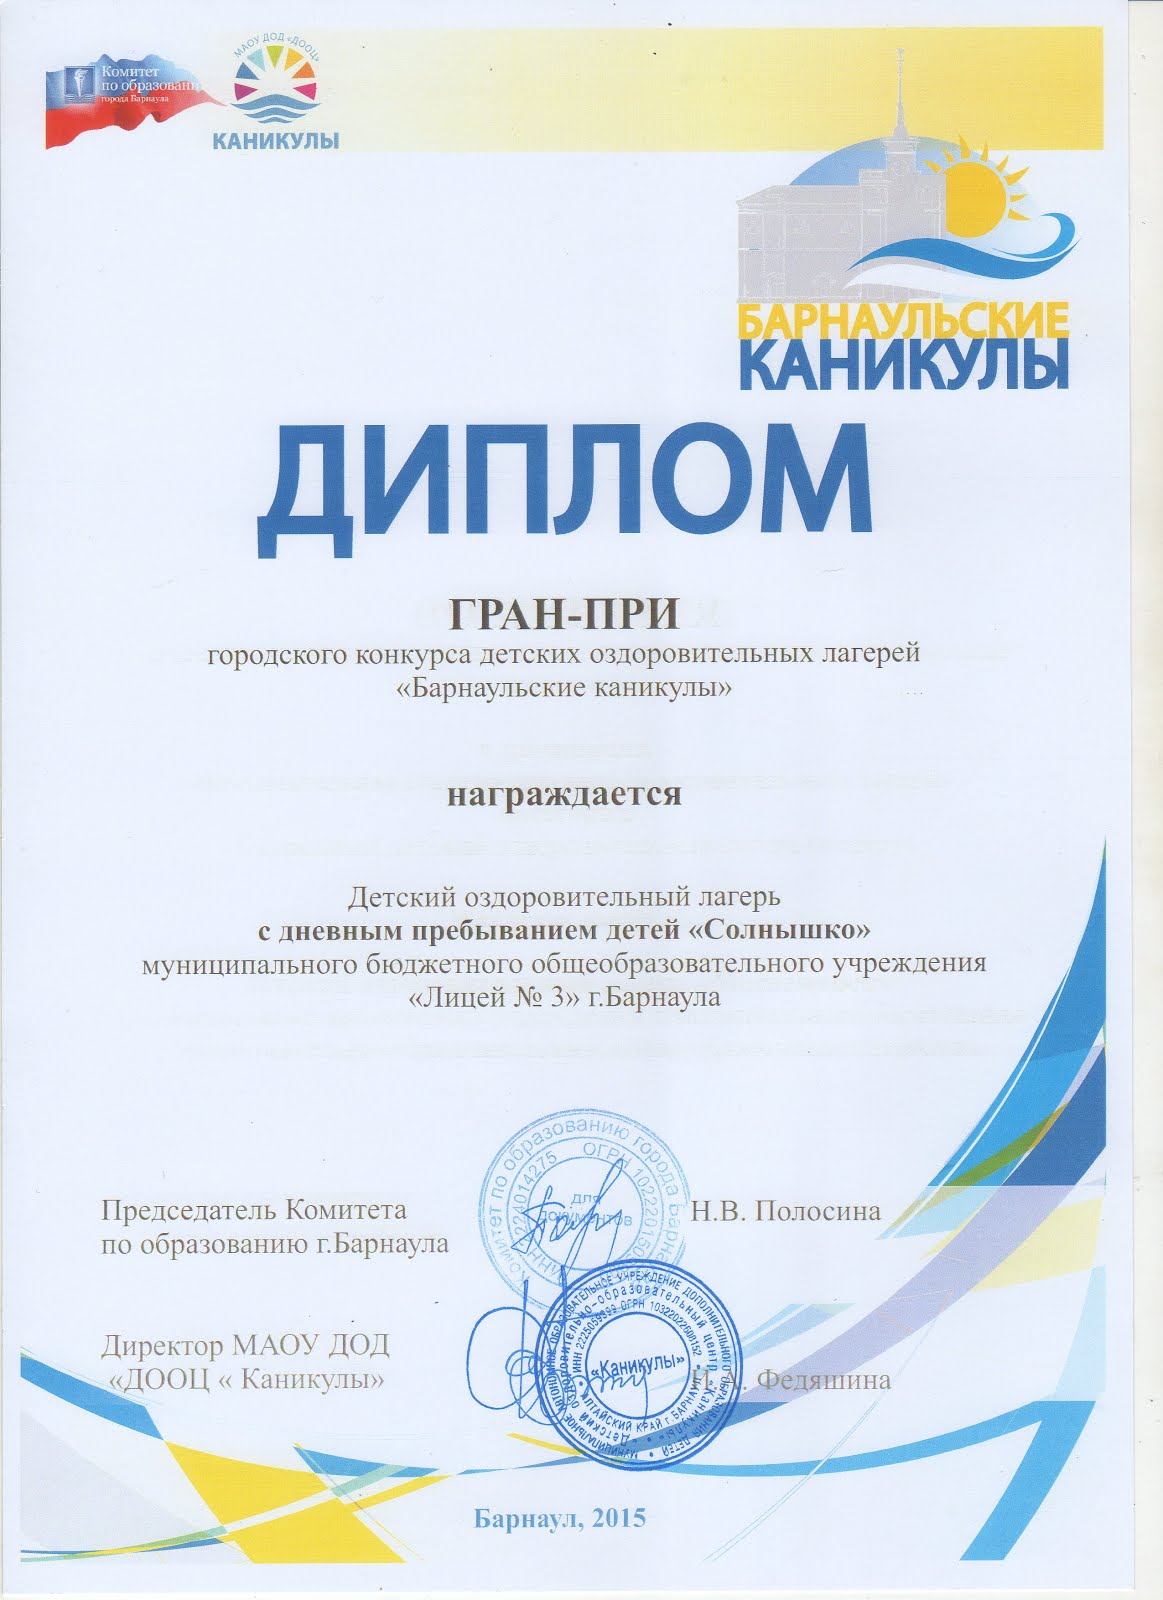 ГРАН-ПРИ 2015 г